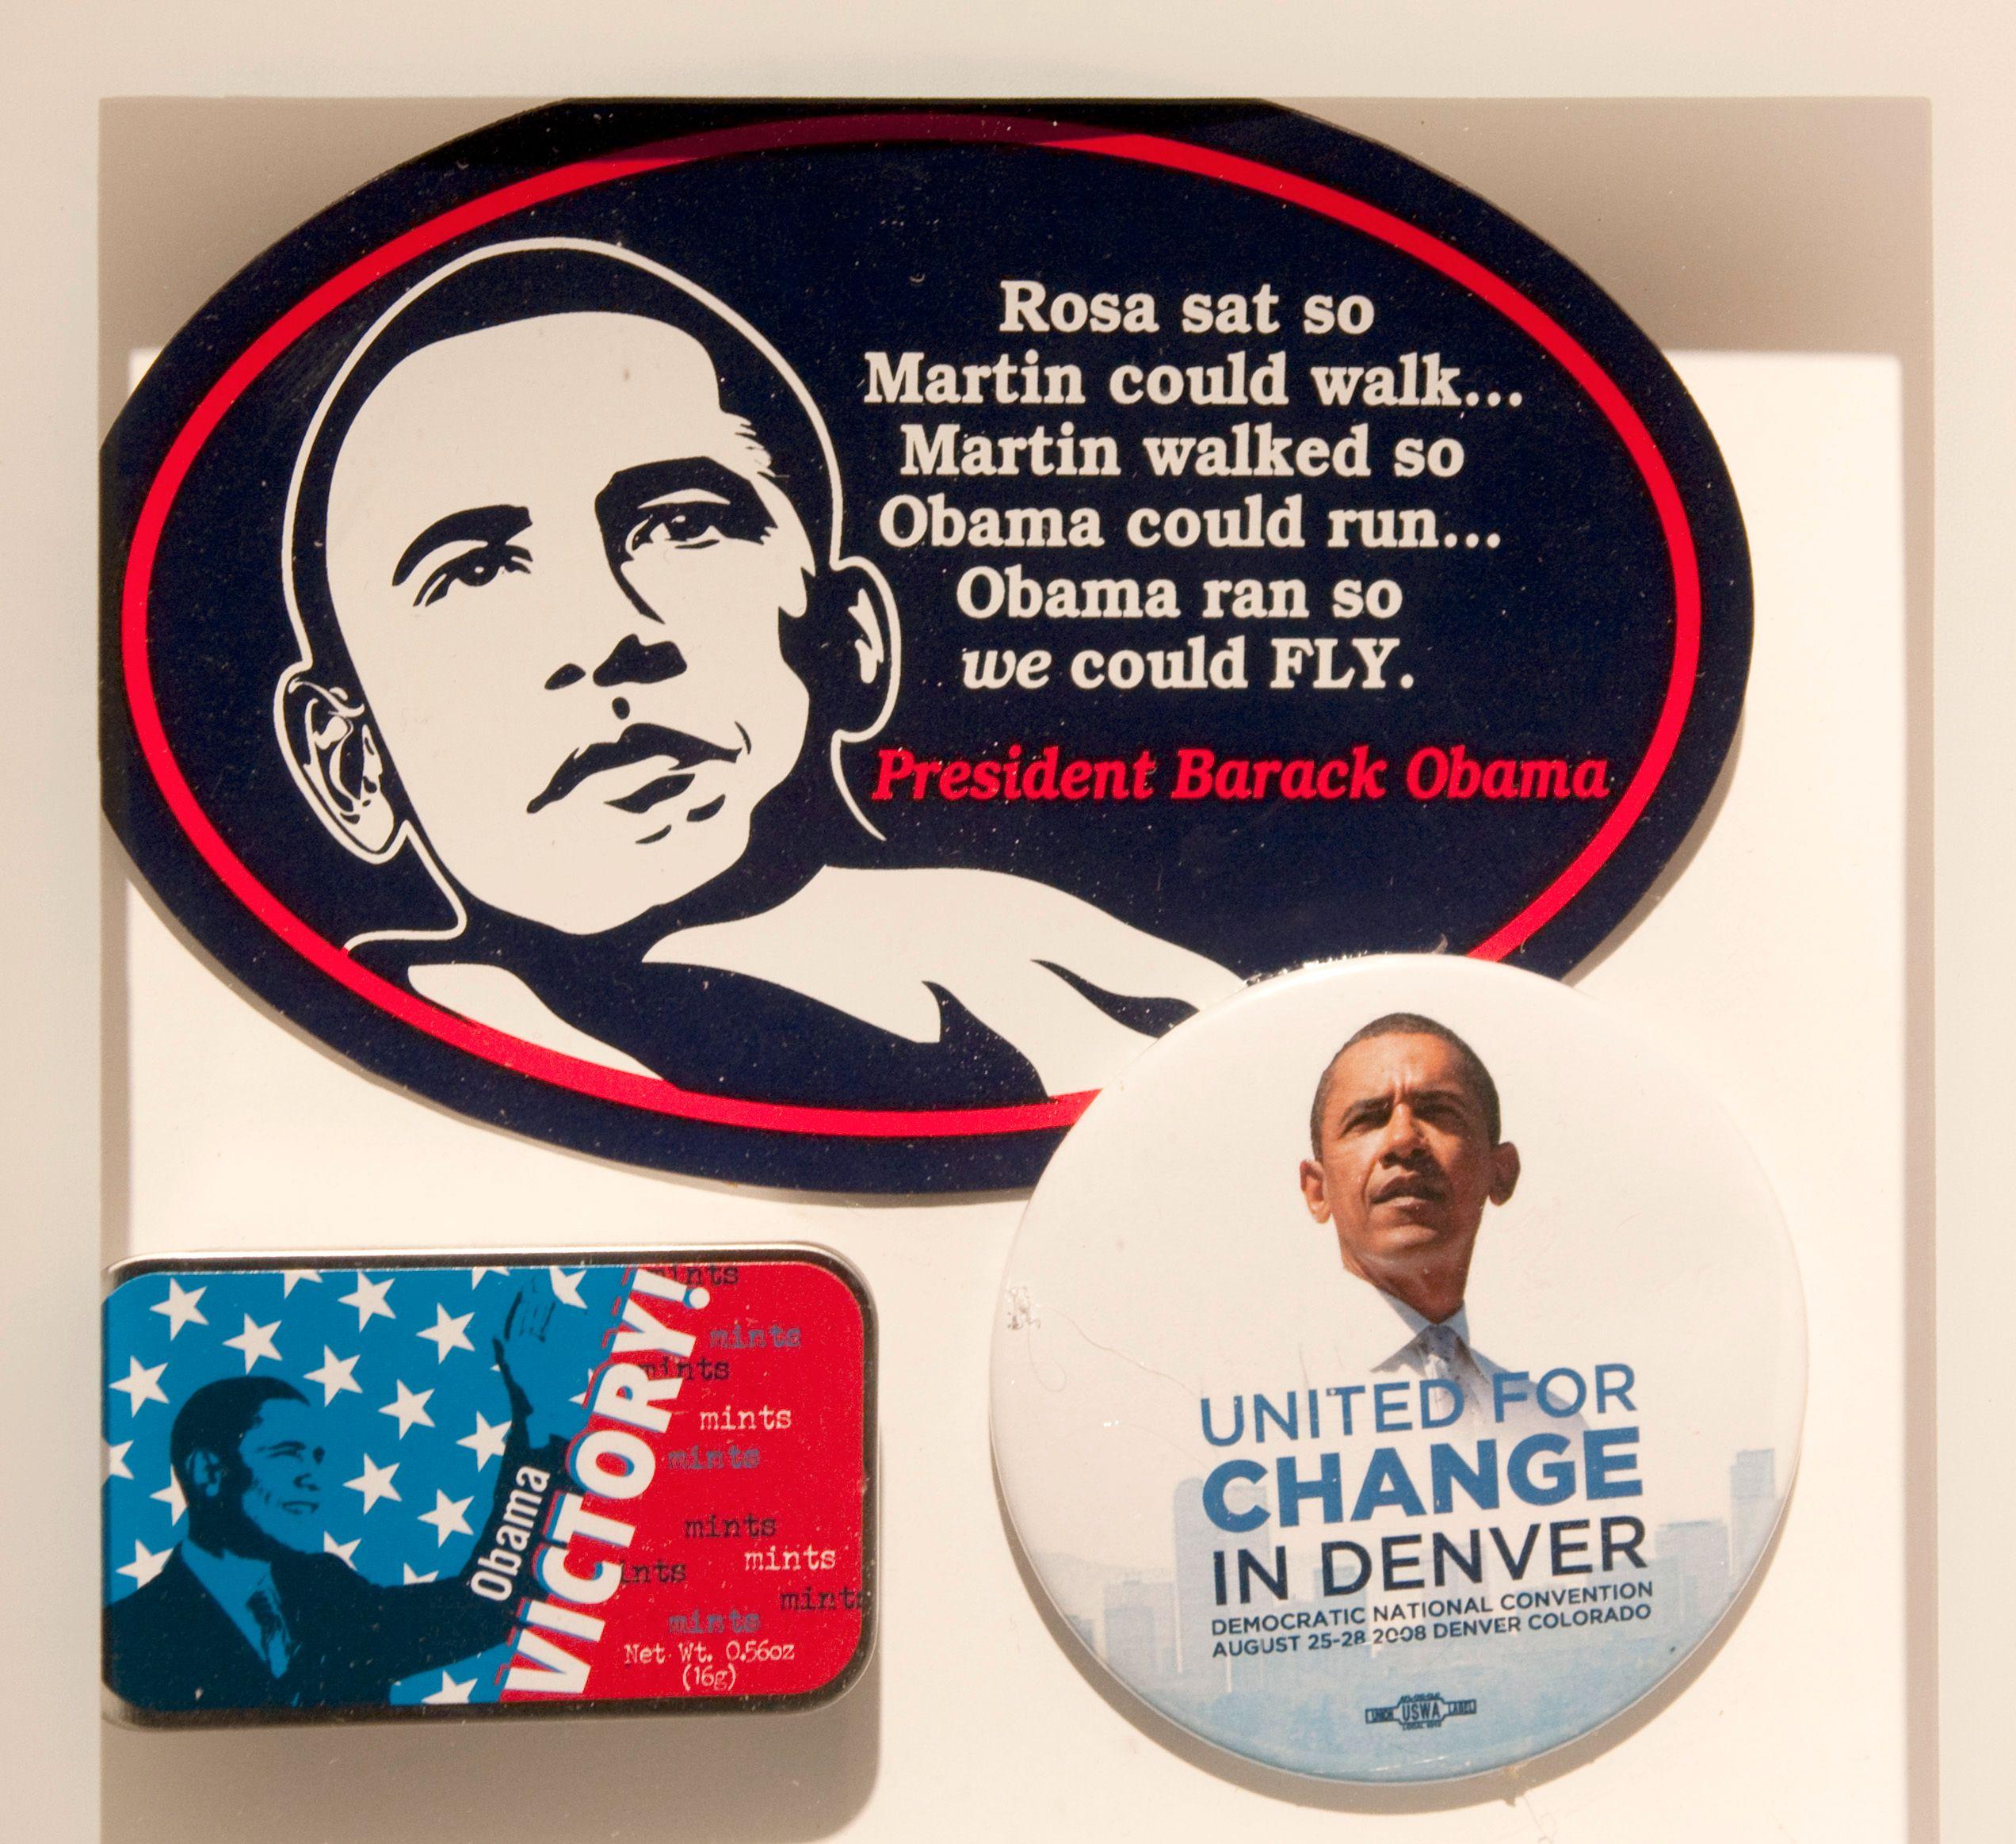 Valgkampeffekter fra Obamas kampanje.